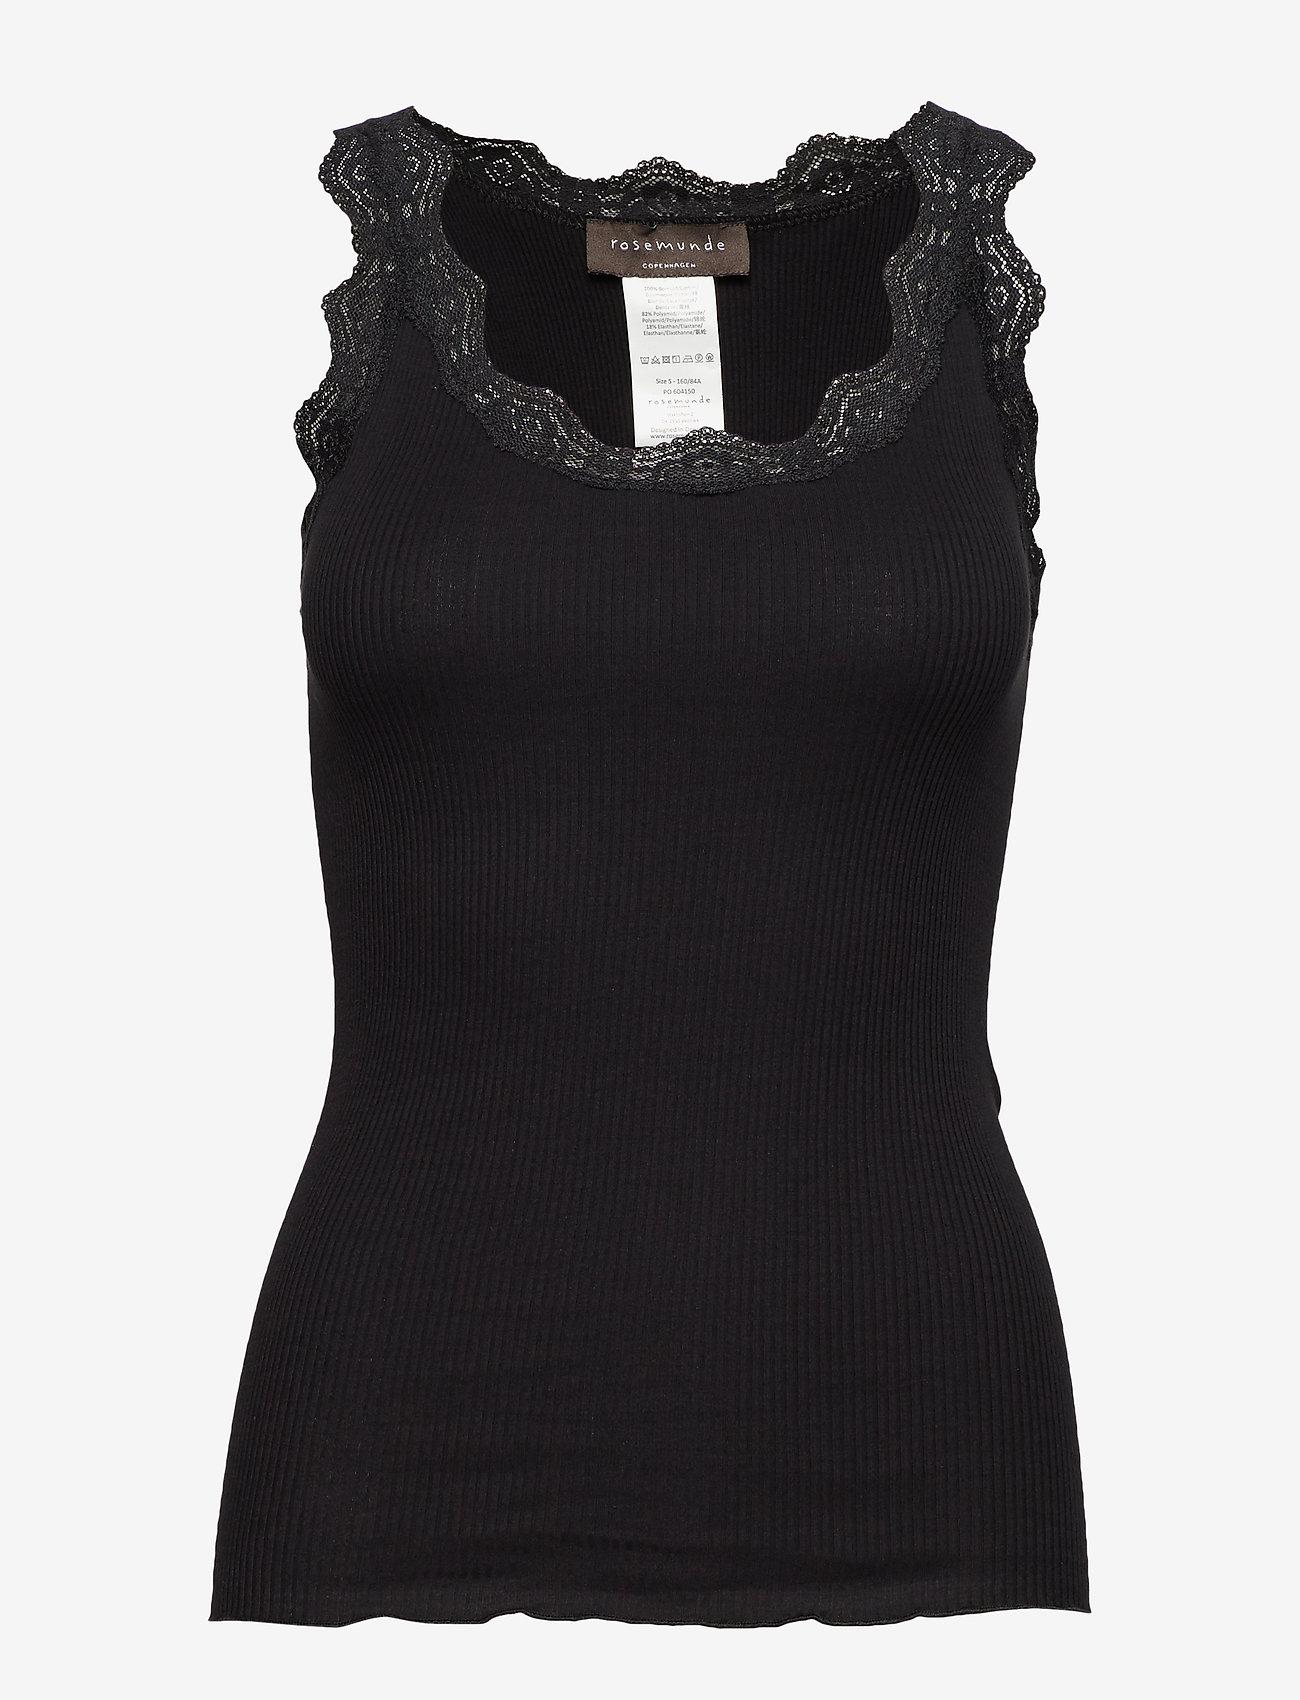 Rosemunde - Organic top w/ lace - tops zonder mouwen - black - 0